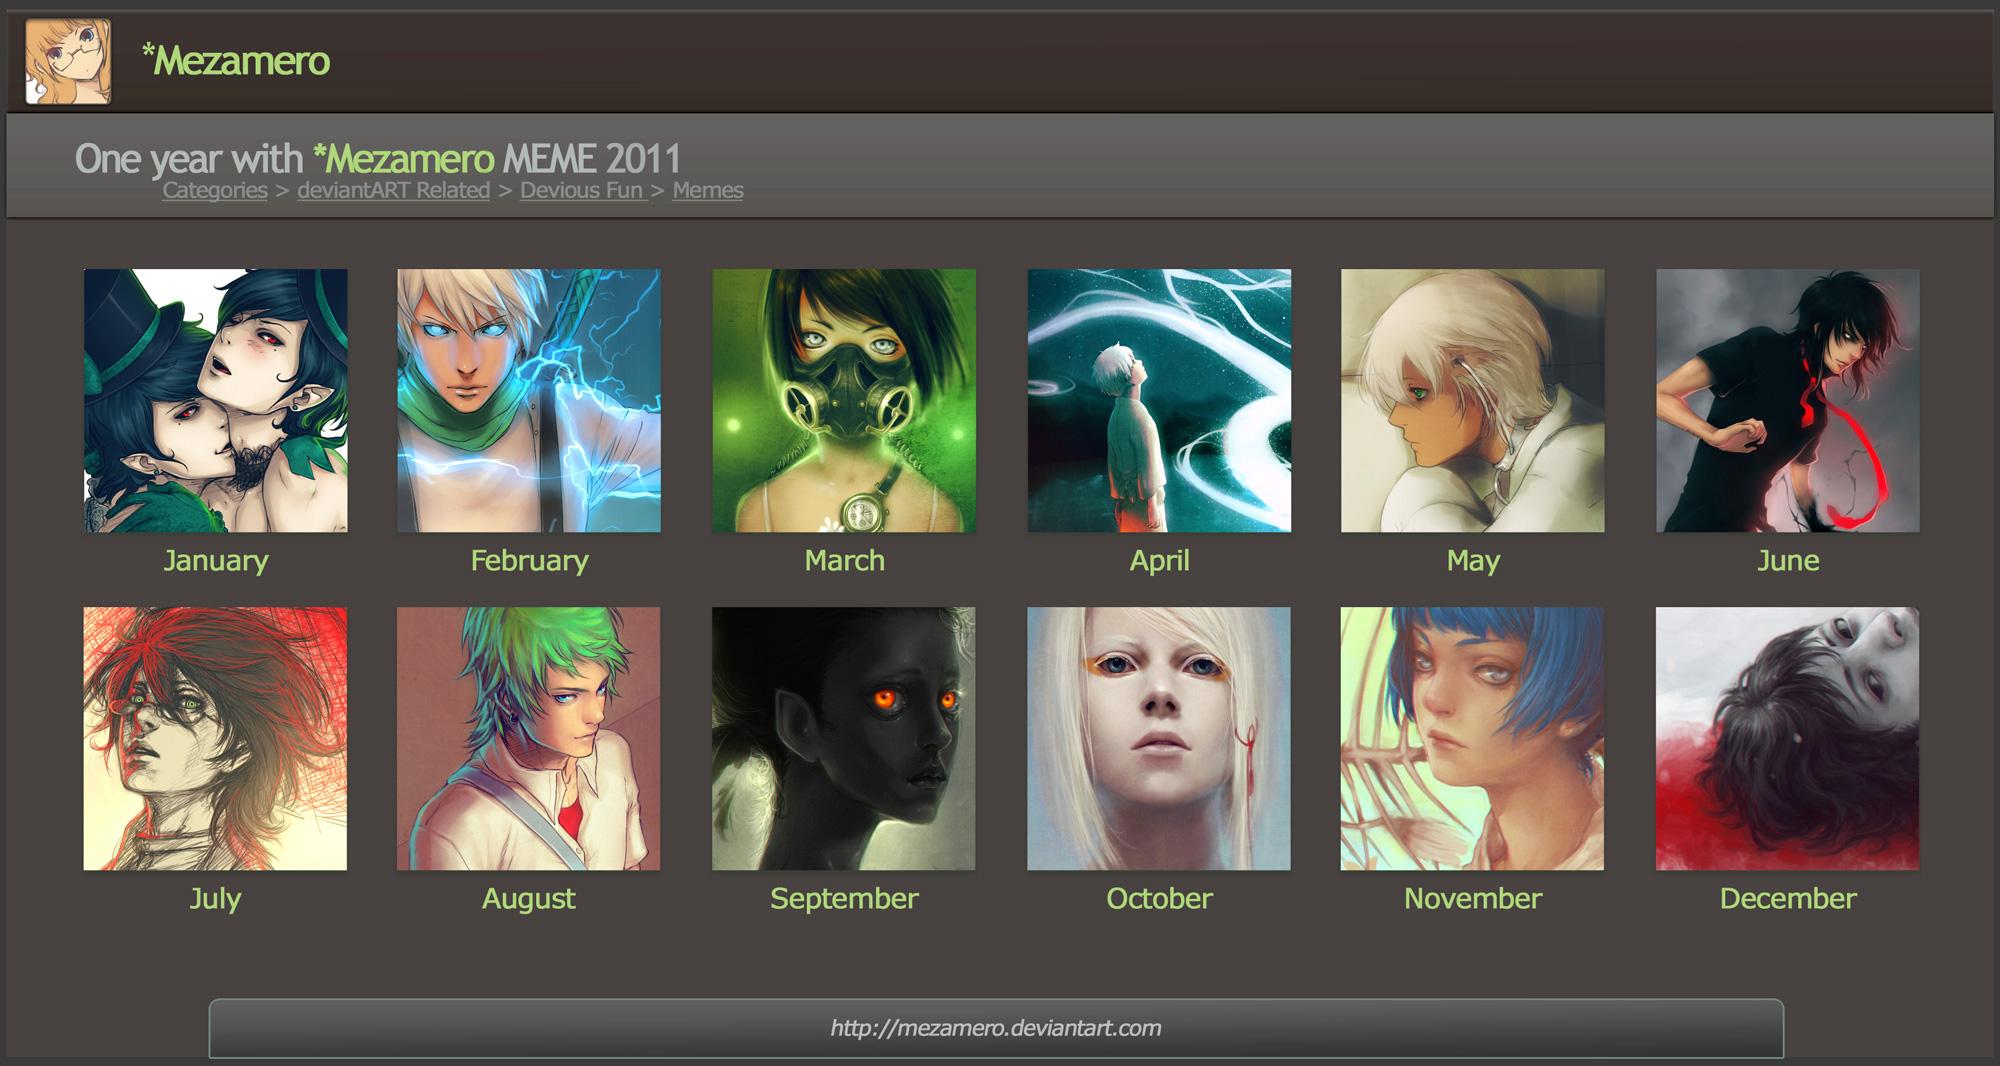 One year with Mezamero 2011 by Mezamero